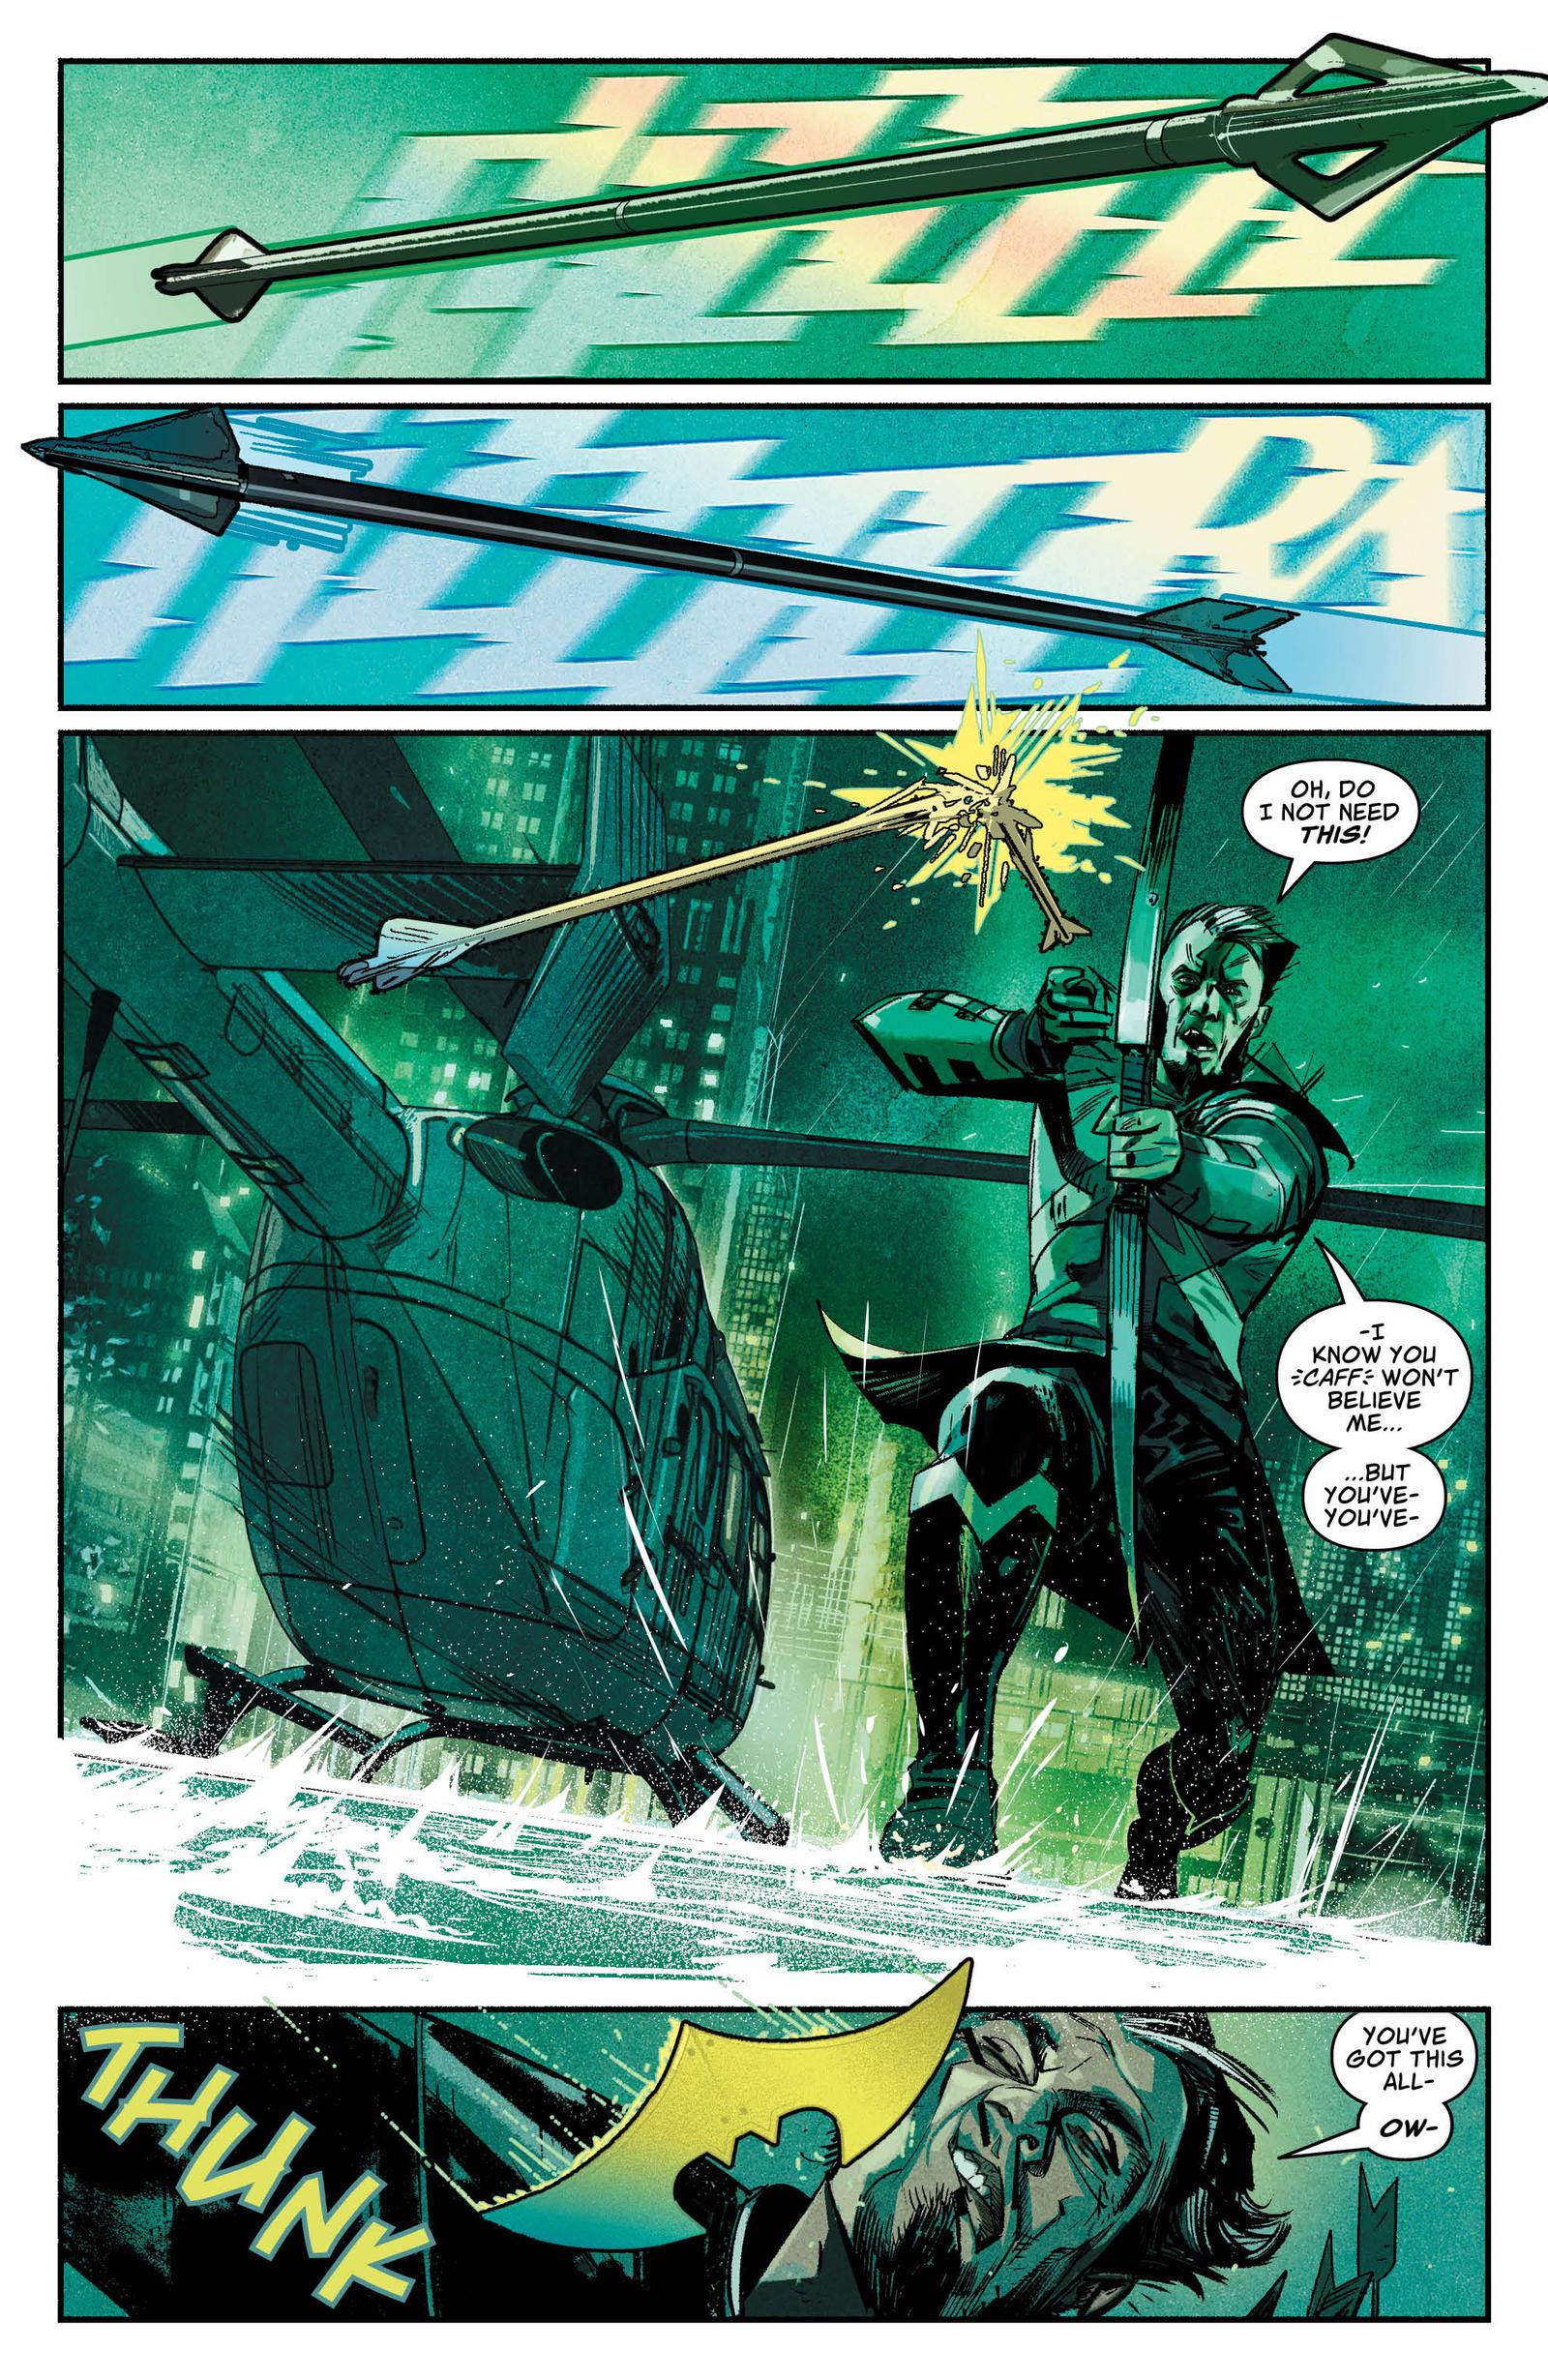 All images: DC Comics